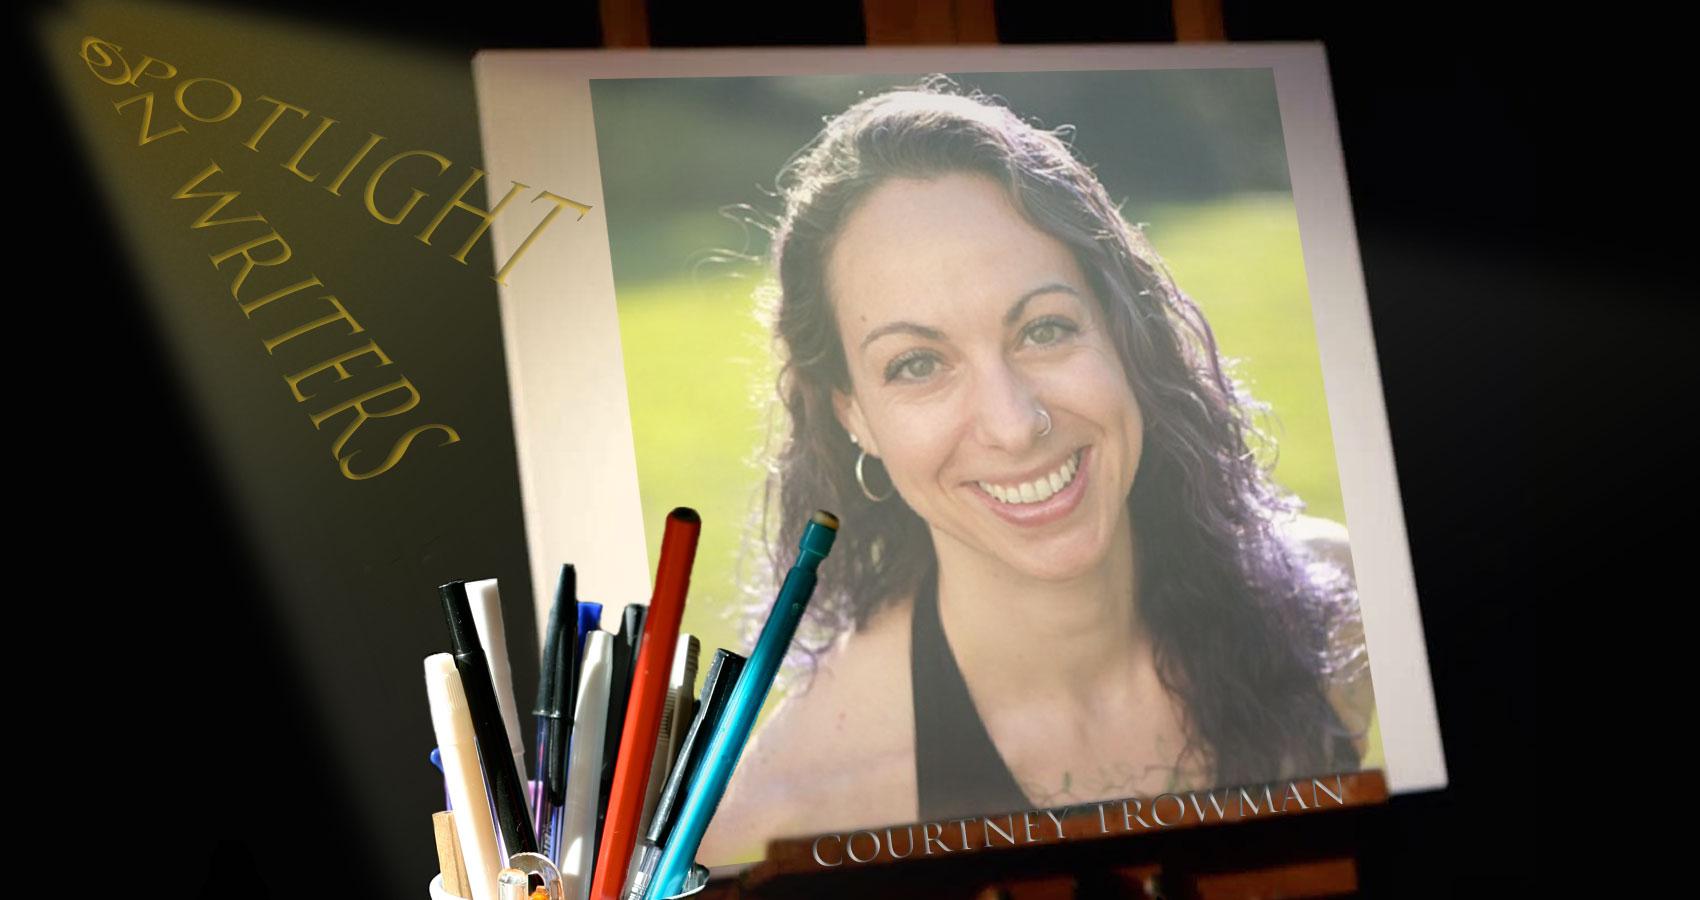 Spotlight On Writers - Courtney Trowman aka CC Bella at Spillwords.com